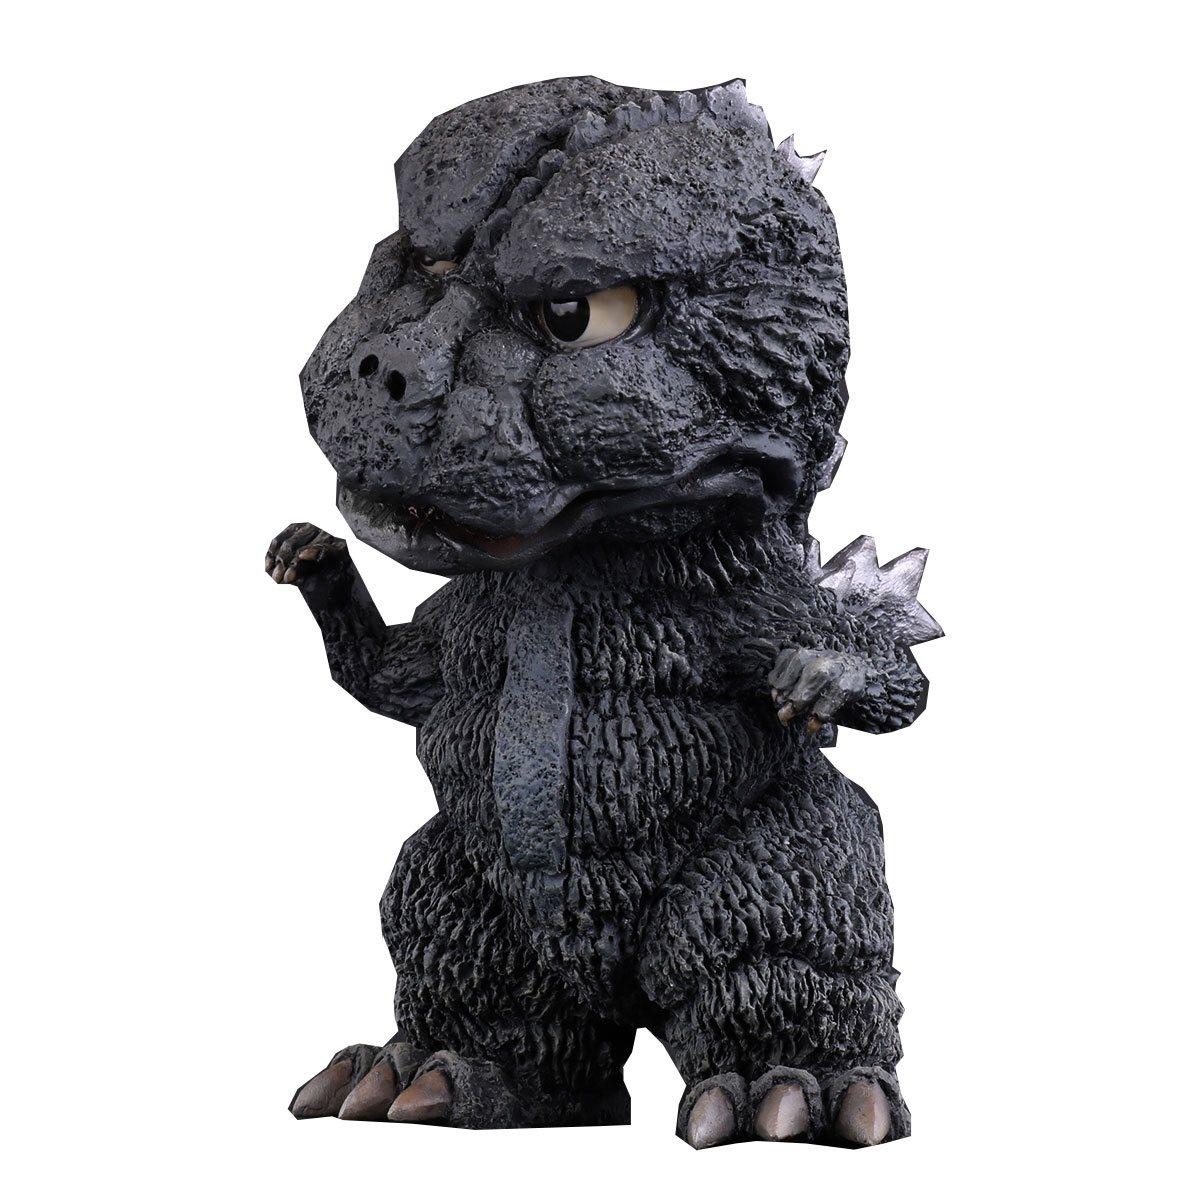 Godzilla 1974 Defo Real Soft Vinyl Statue